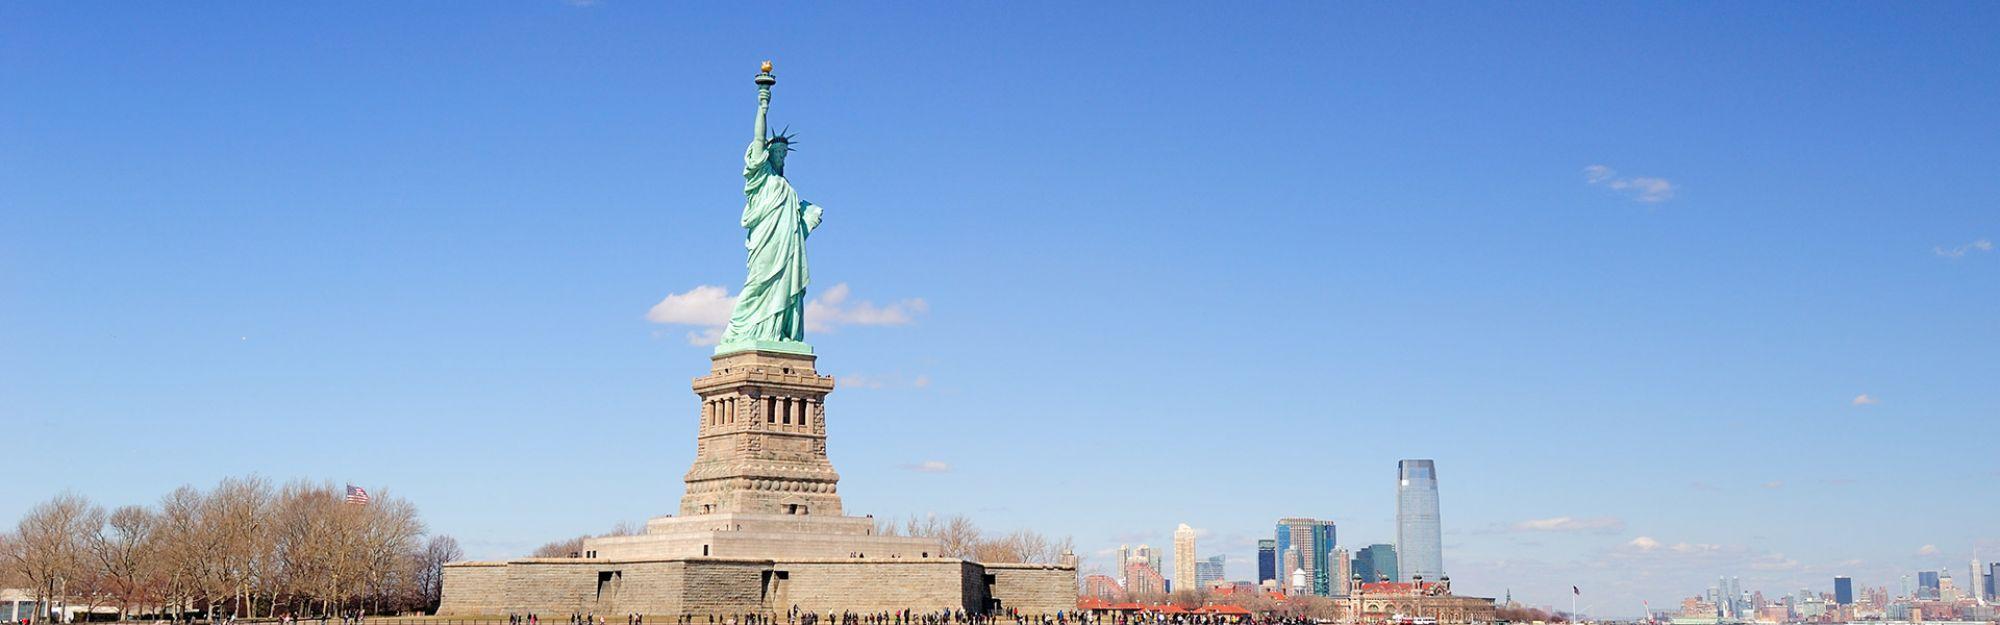 New York Classic Ticket + Statue of Liberty & Ellis Island Ferry